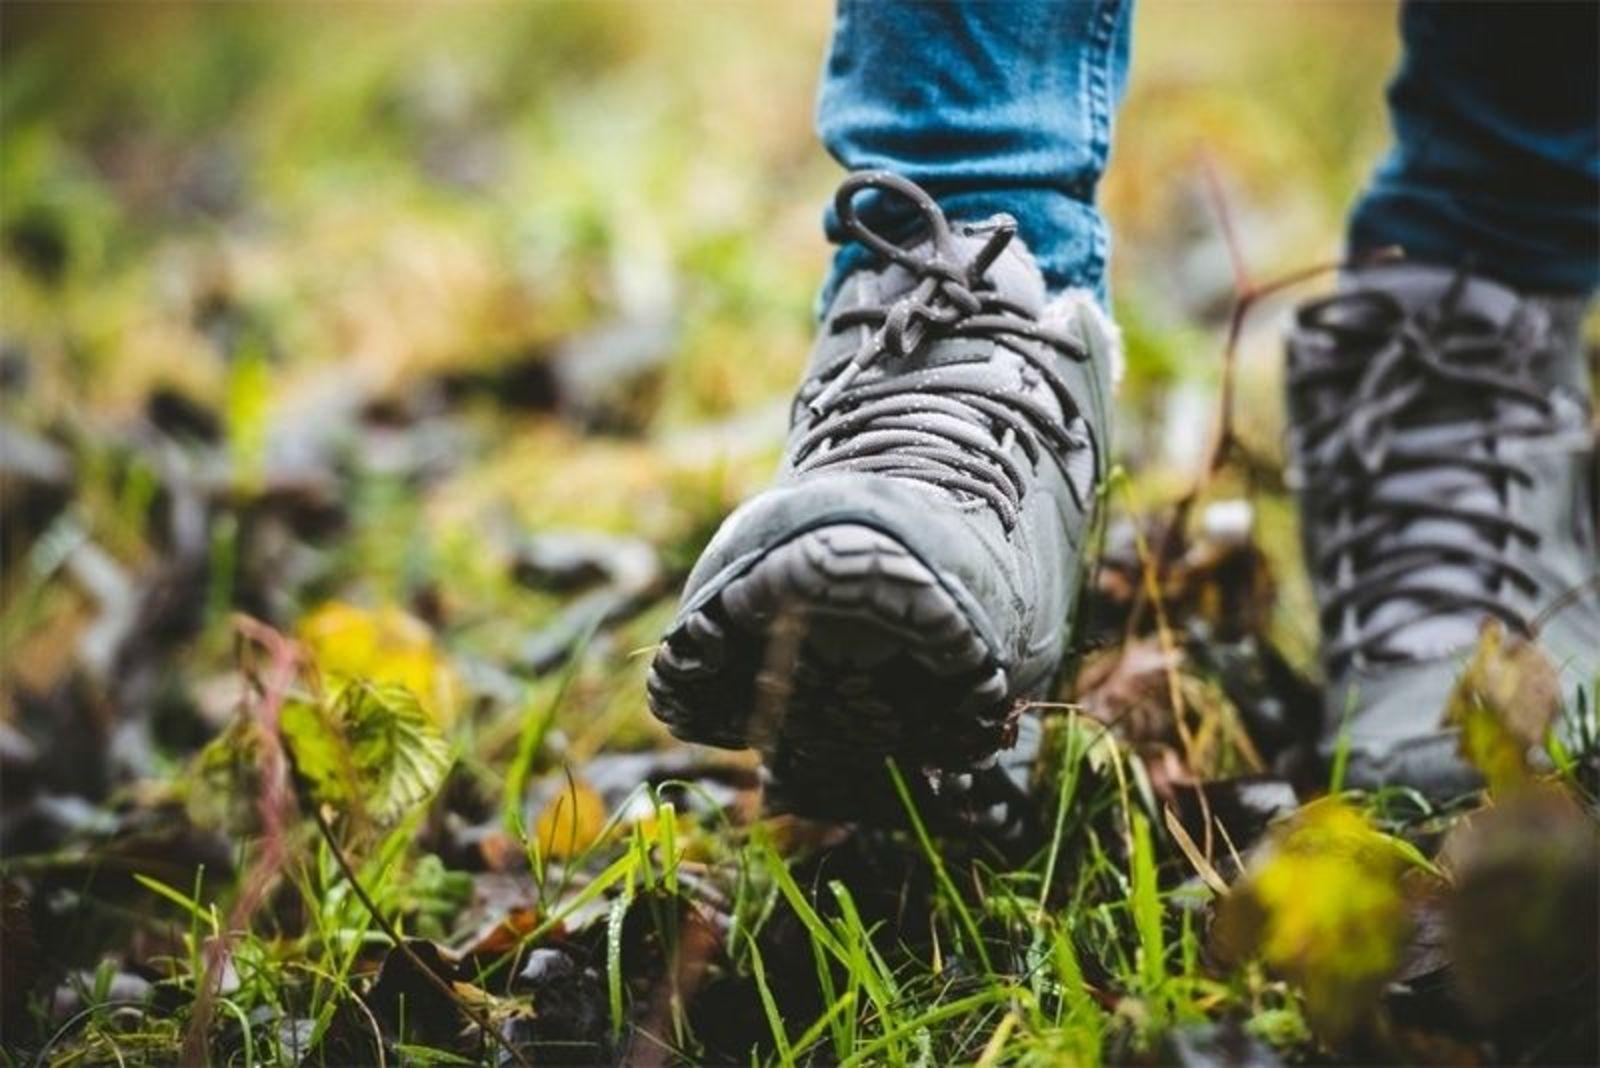 Reggestreek Four Day Walking event, camp 6 nights